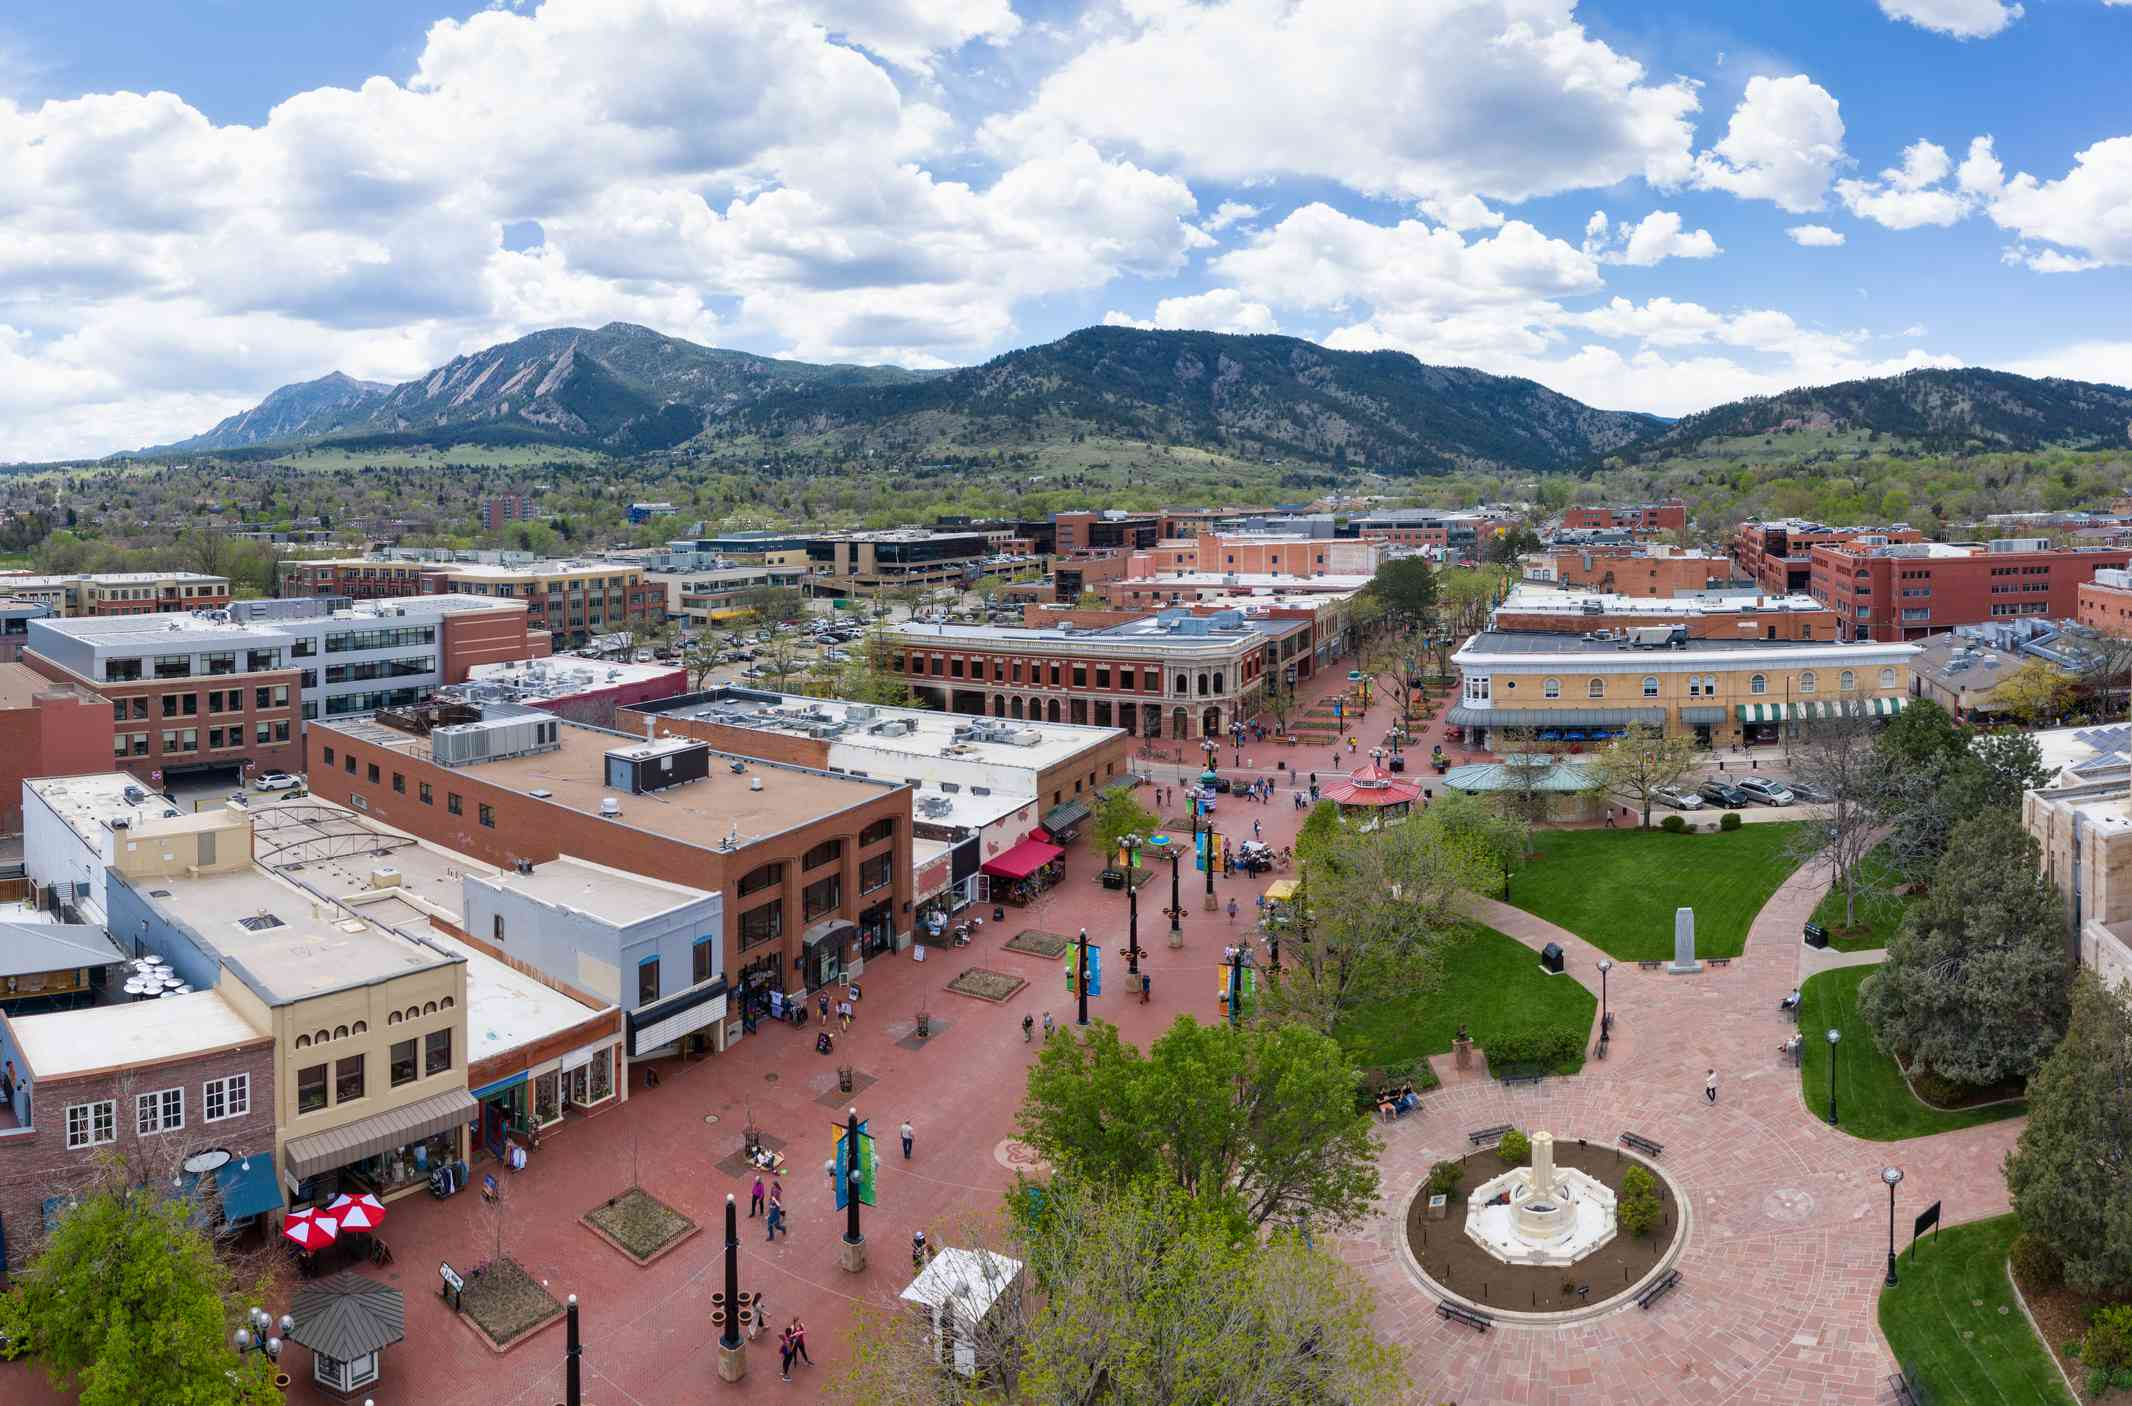 Pearl Street Mall in Boulder, Colorado